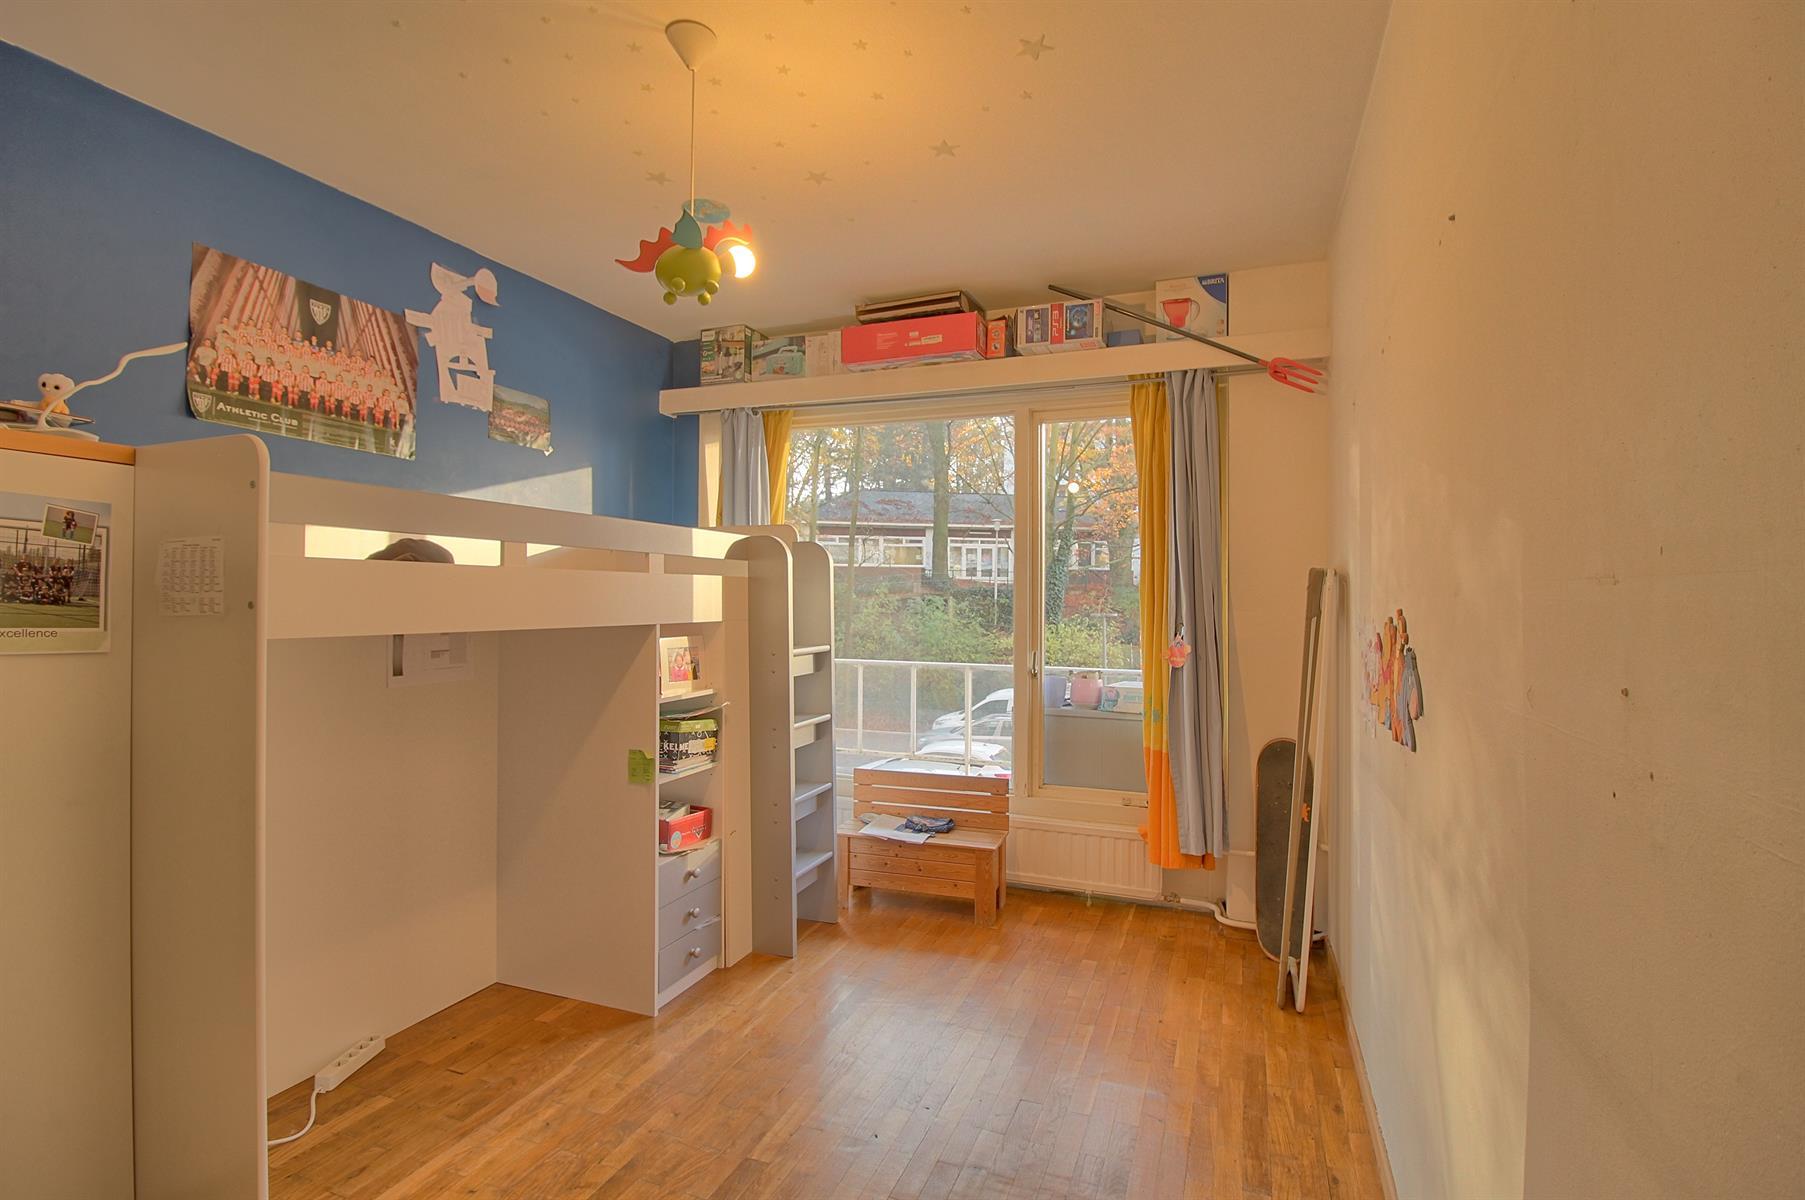 Appartement - Woluwe-Saint-Lambert - #4213719-2